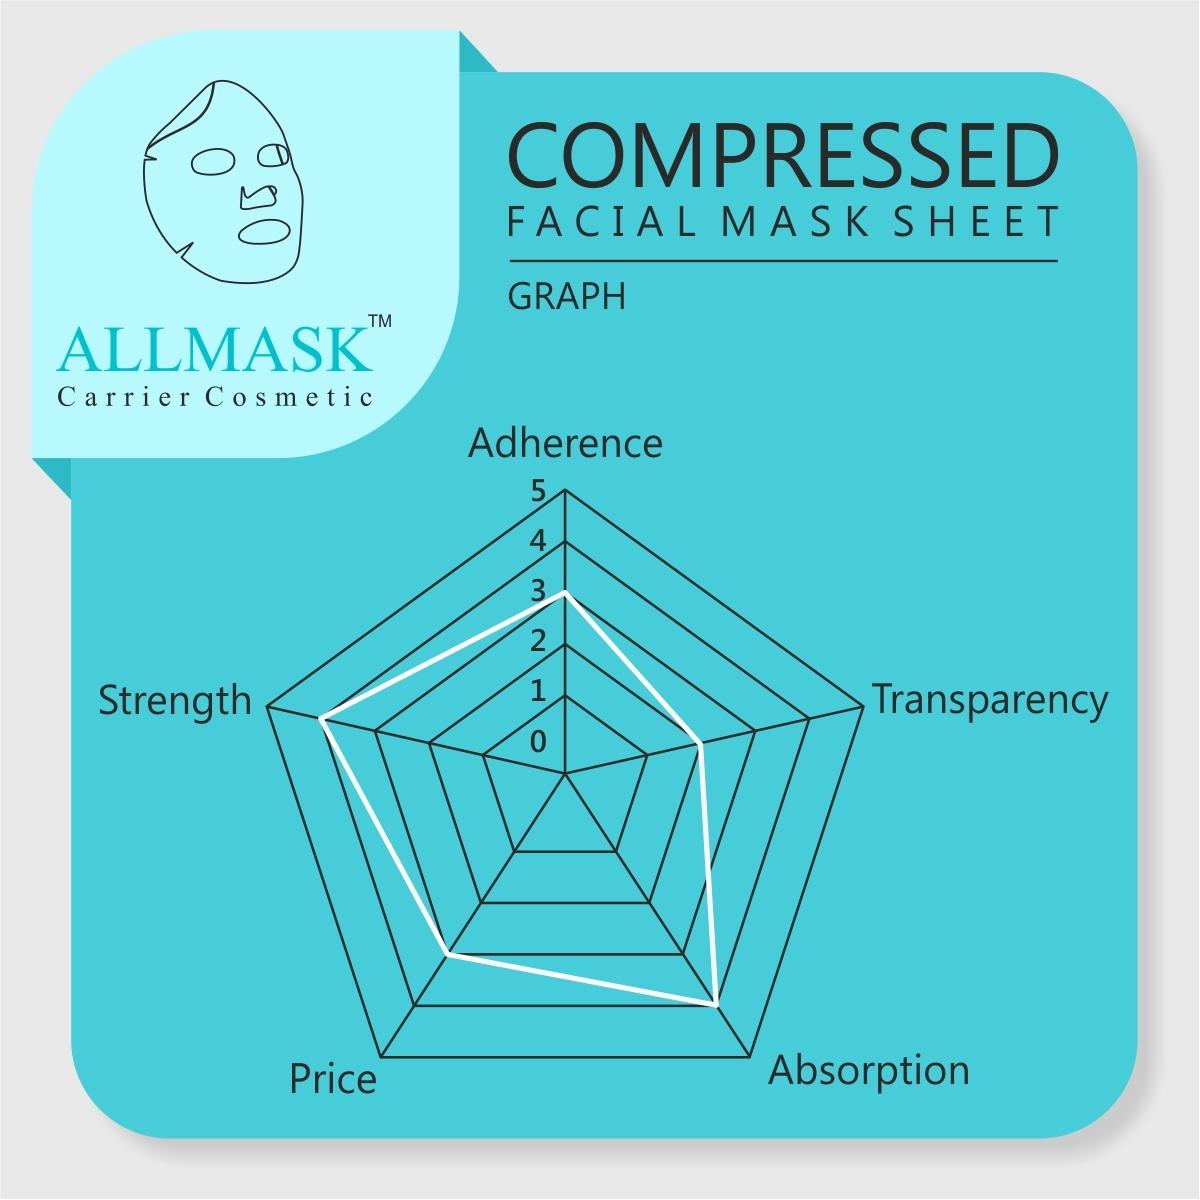 Compressed Facial Mask Sheet